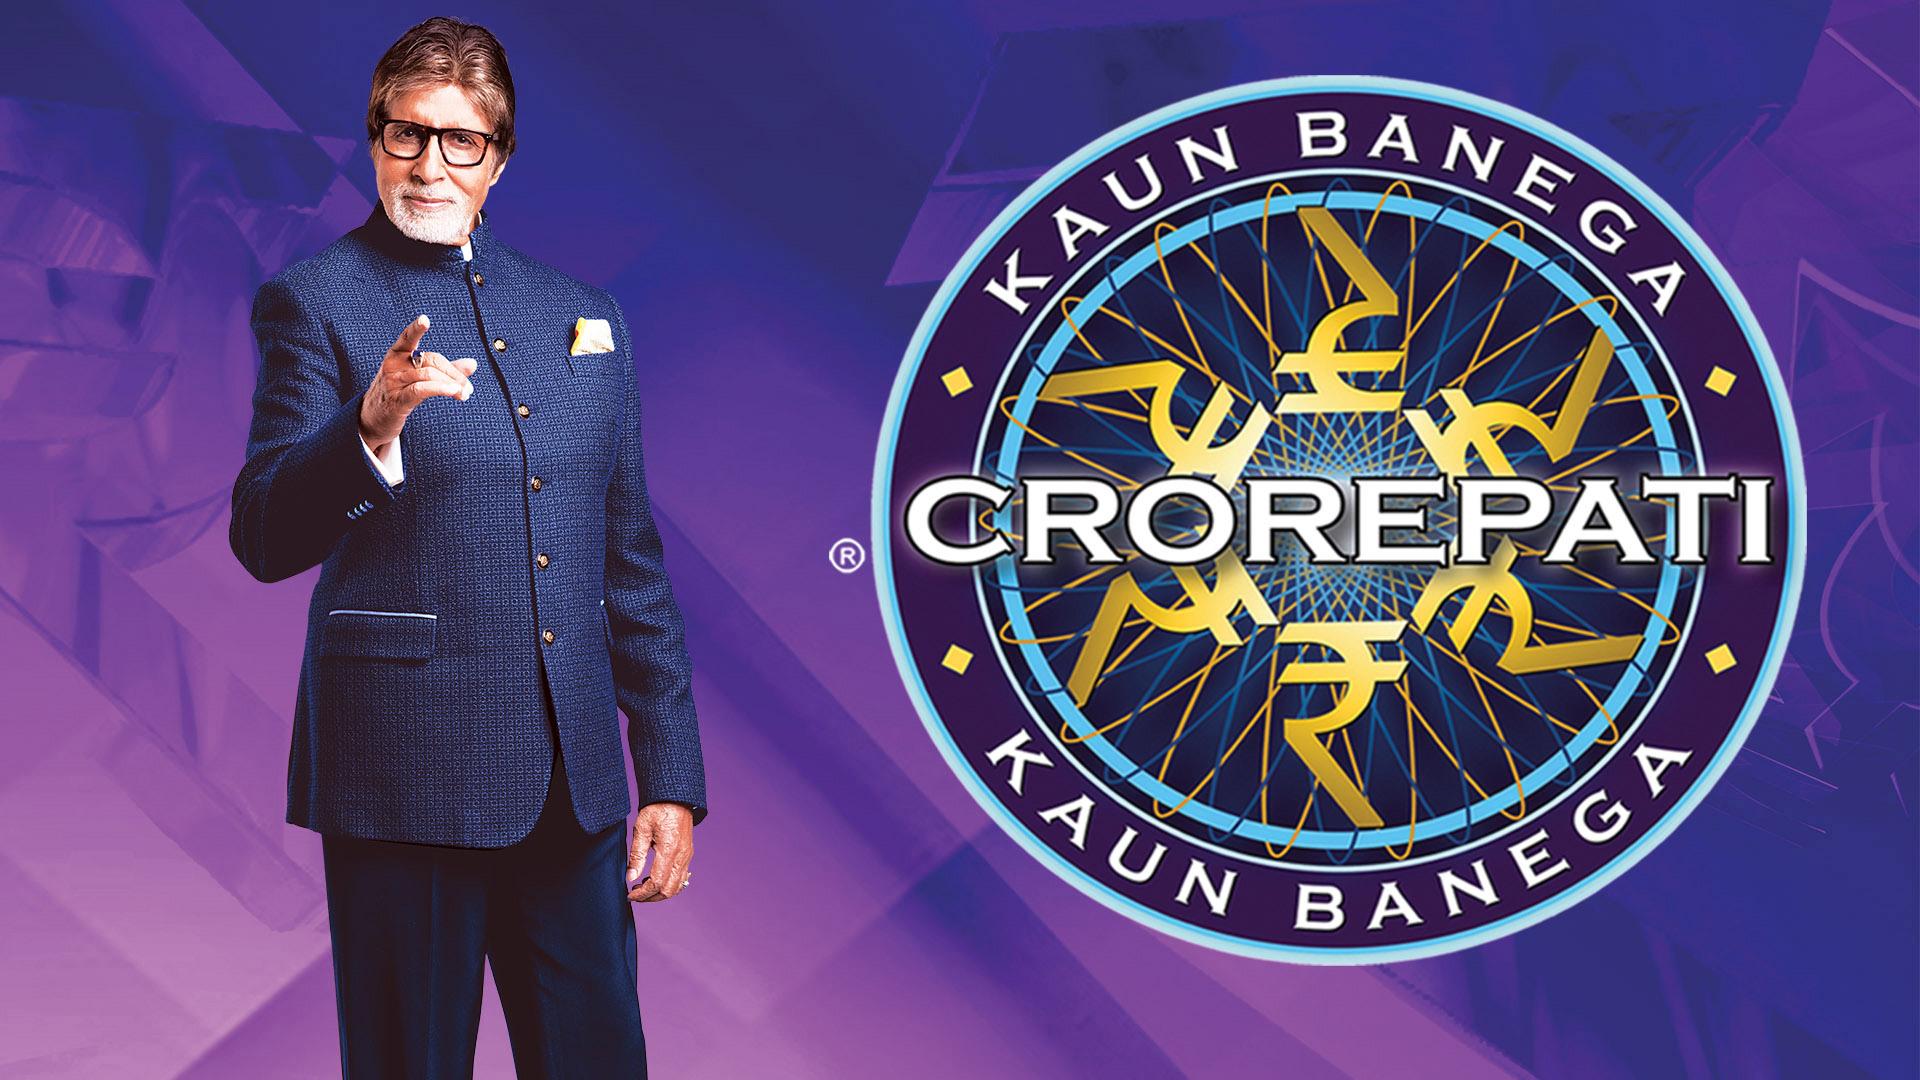 Amitabh Bachchan And His Trendy Glasses Make A Comeback On KBC Sets; Gets Cool Response